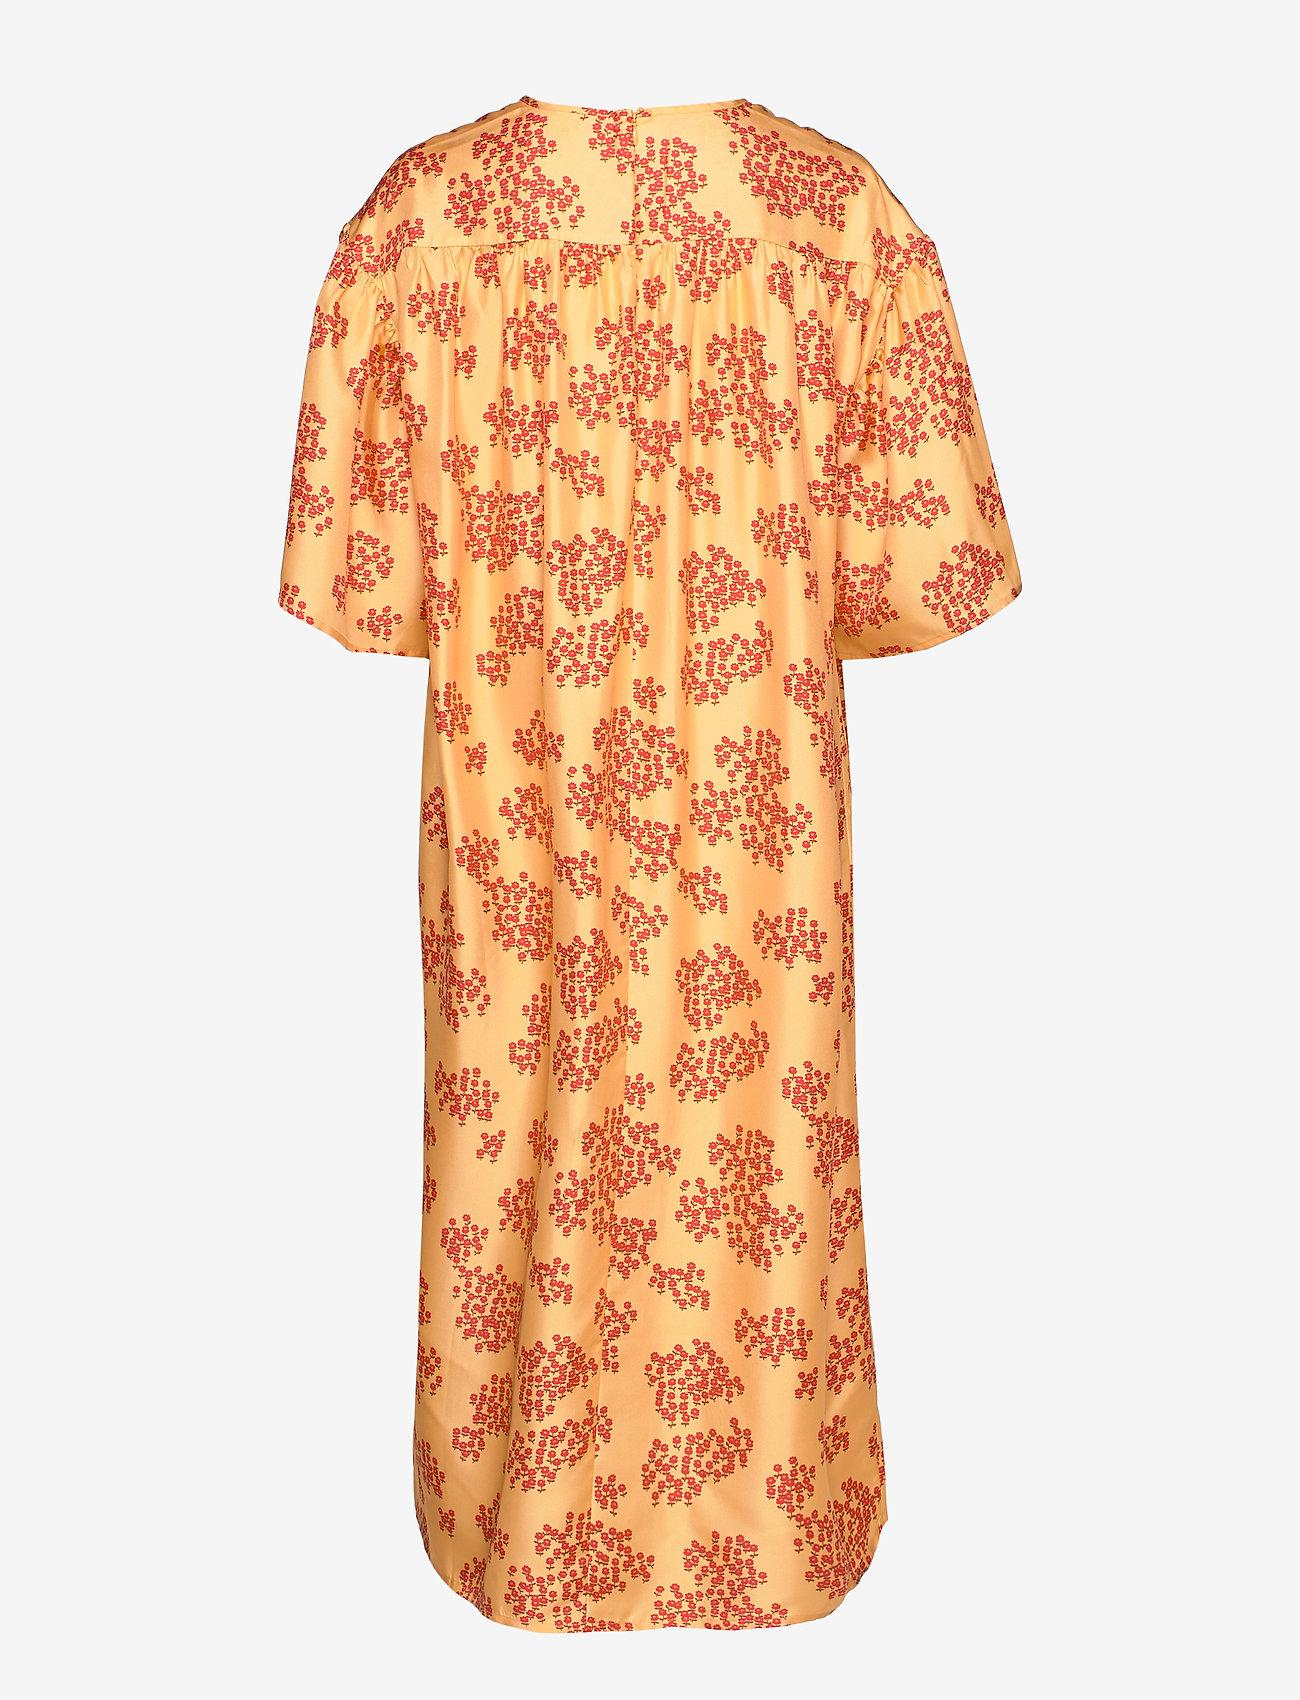 Cosima Dress (Cornsilk) (3006.50 kr) - Lovechild 1979